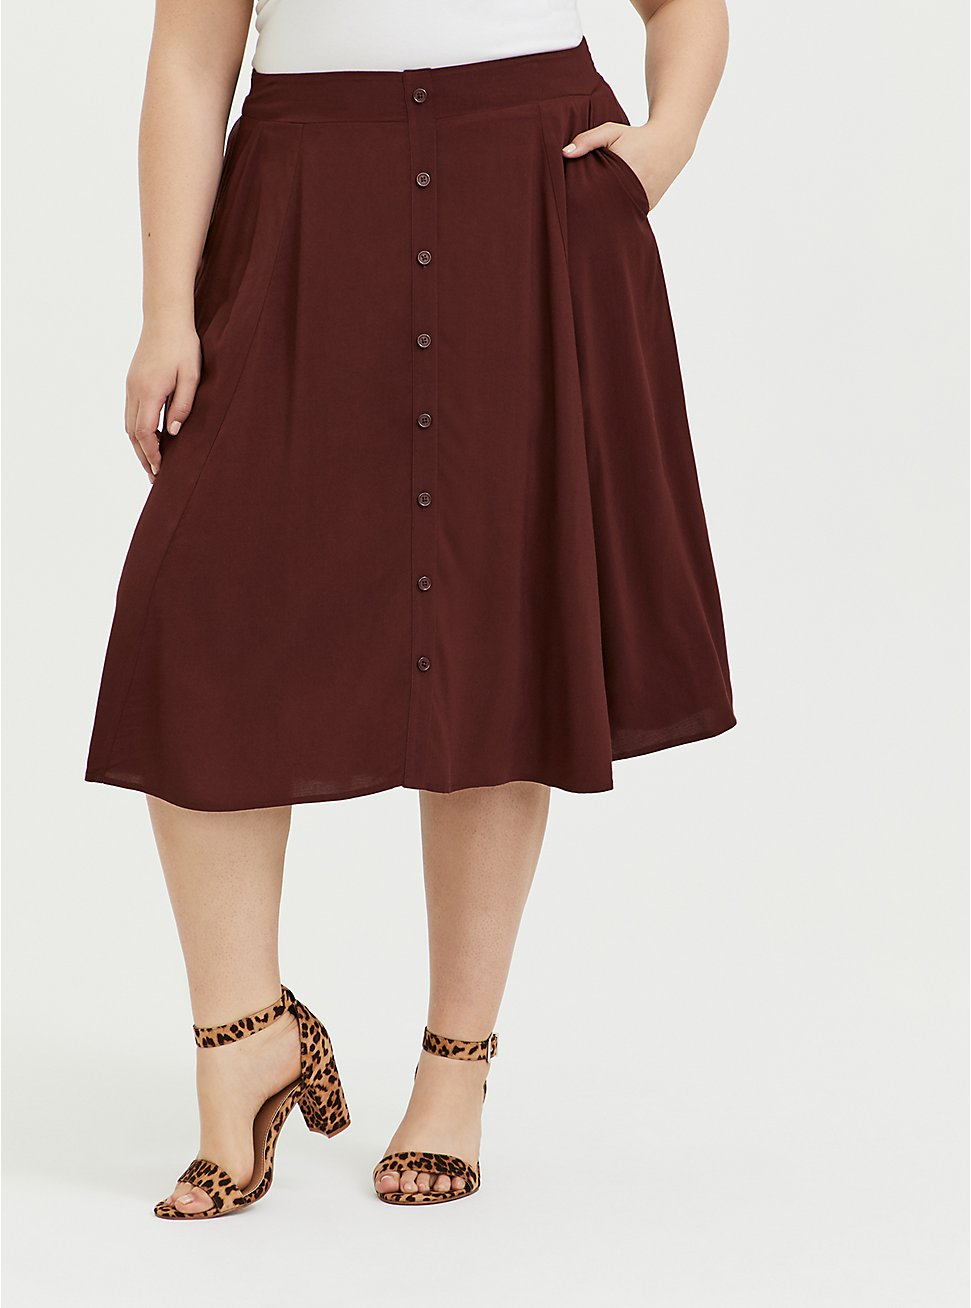 Chocolate Brown Challis Button Midi Skirt, CHOCOLATE BROWN, hi-res